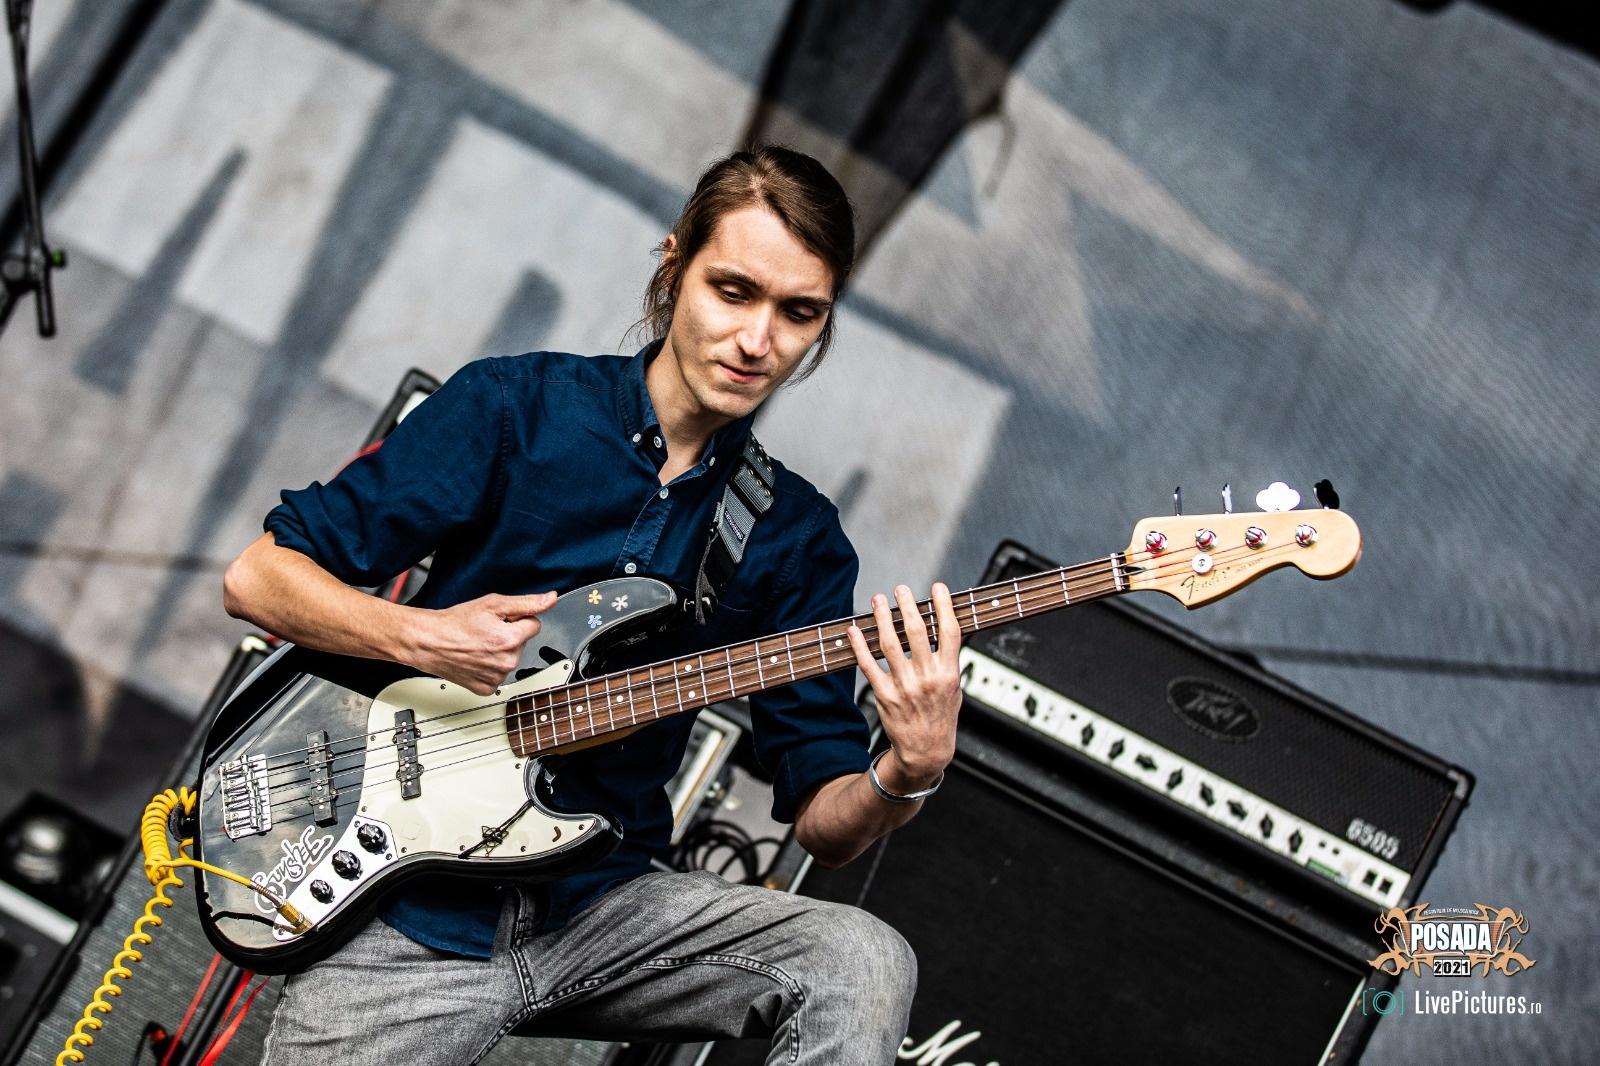 gunshee la posada rock 21 bass